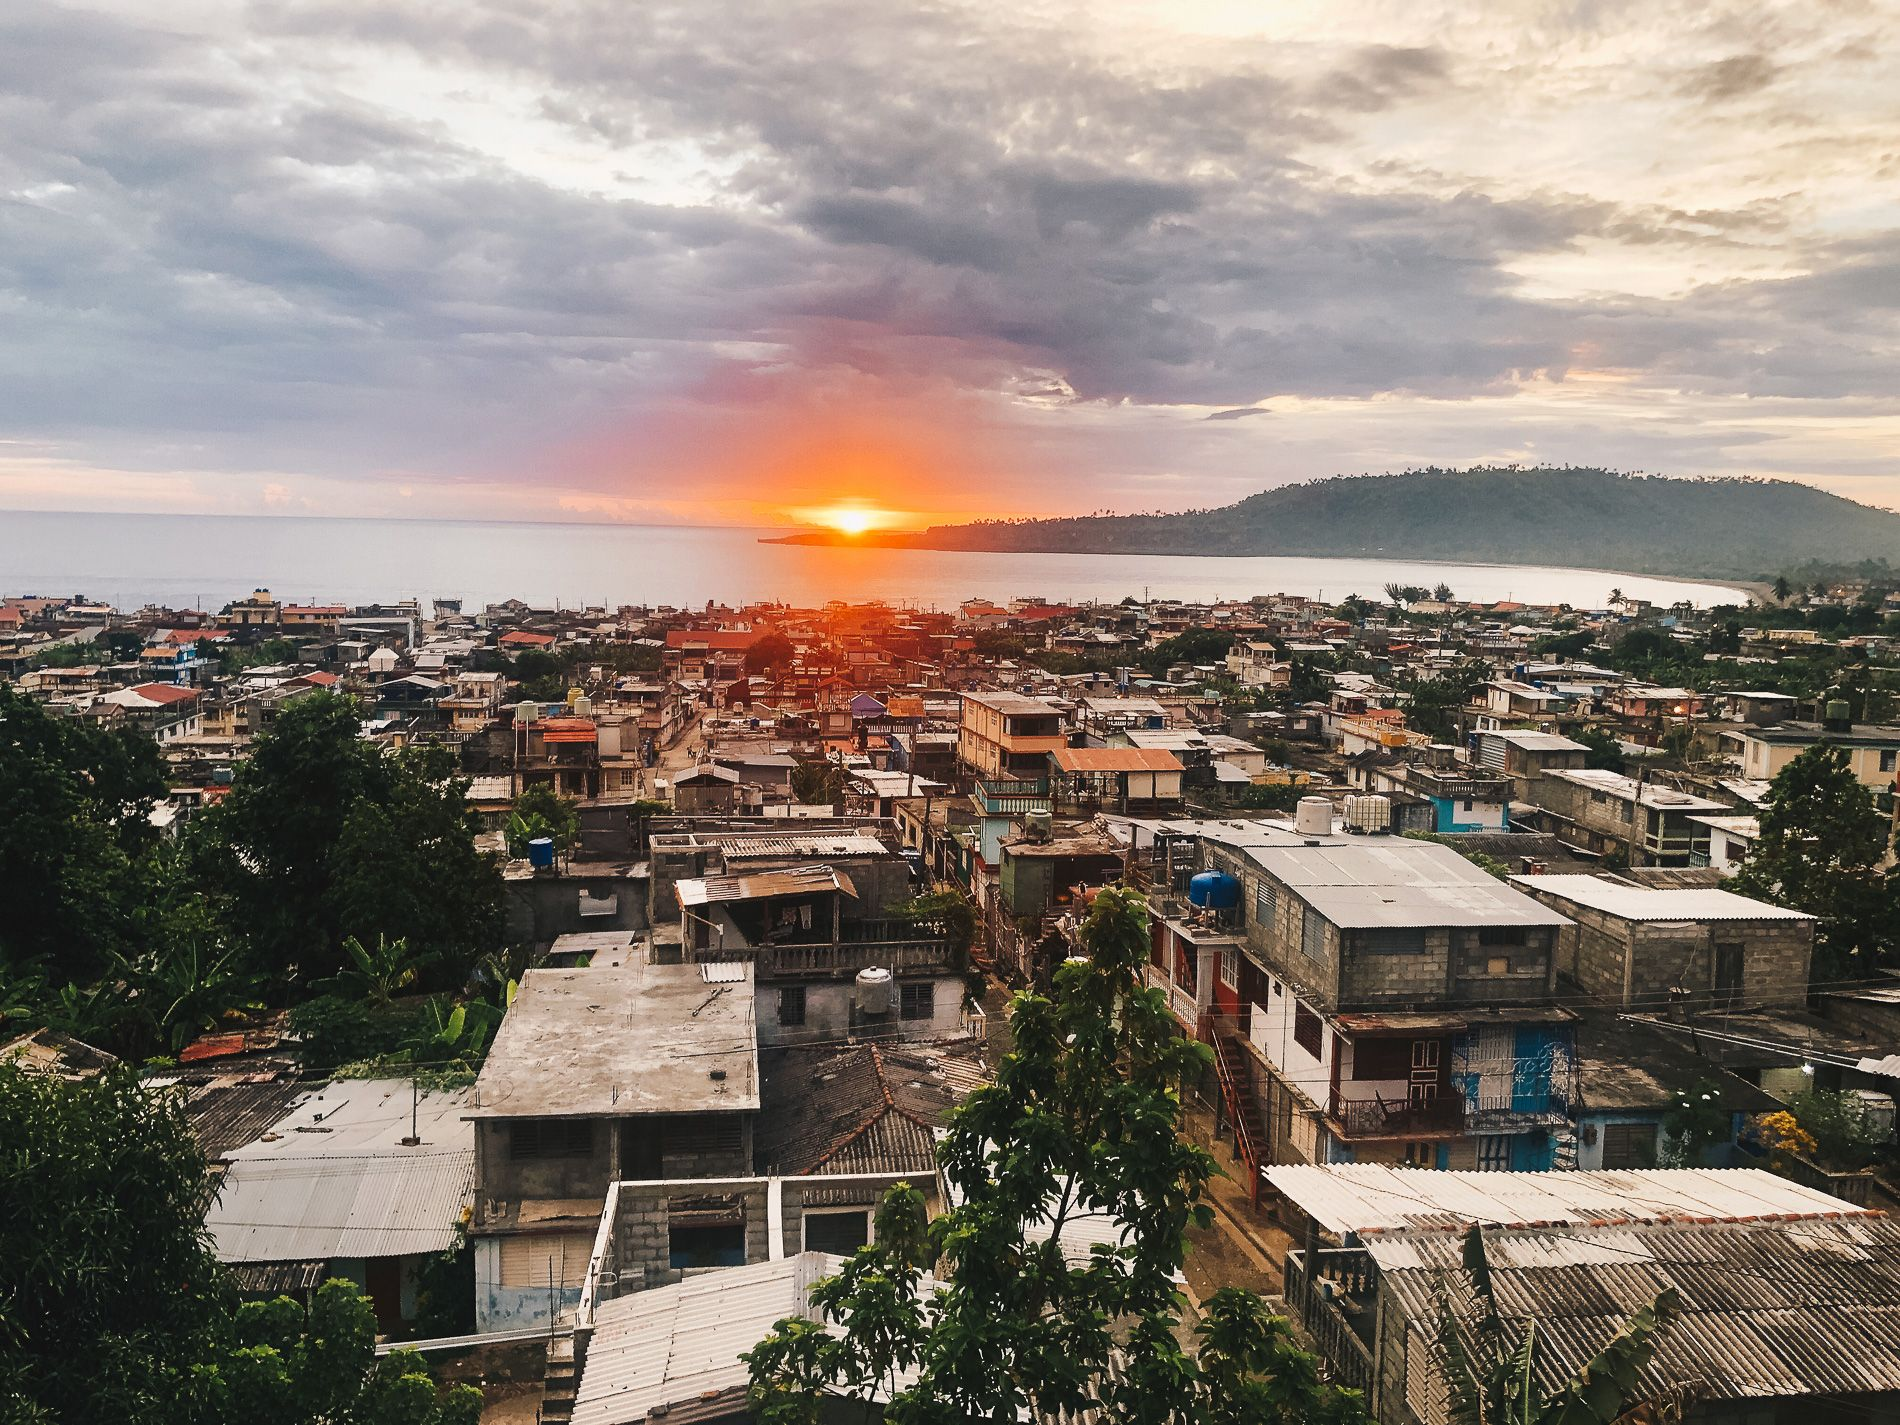 Cuba |Baracoa |Coucher de soleil